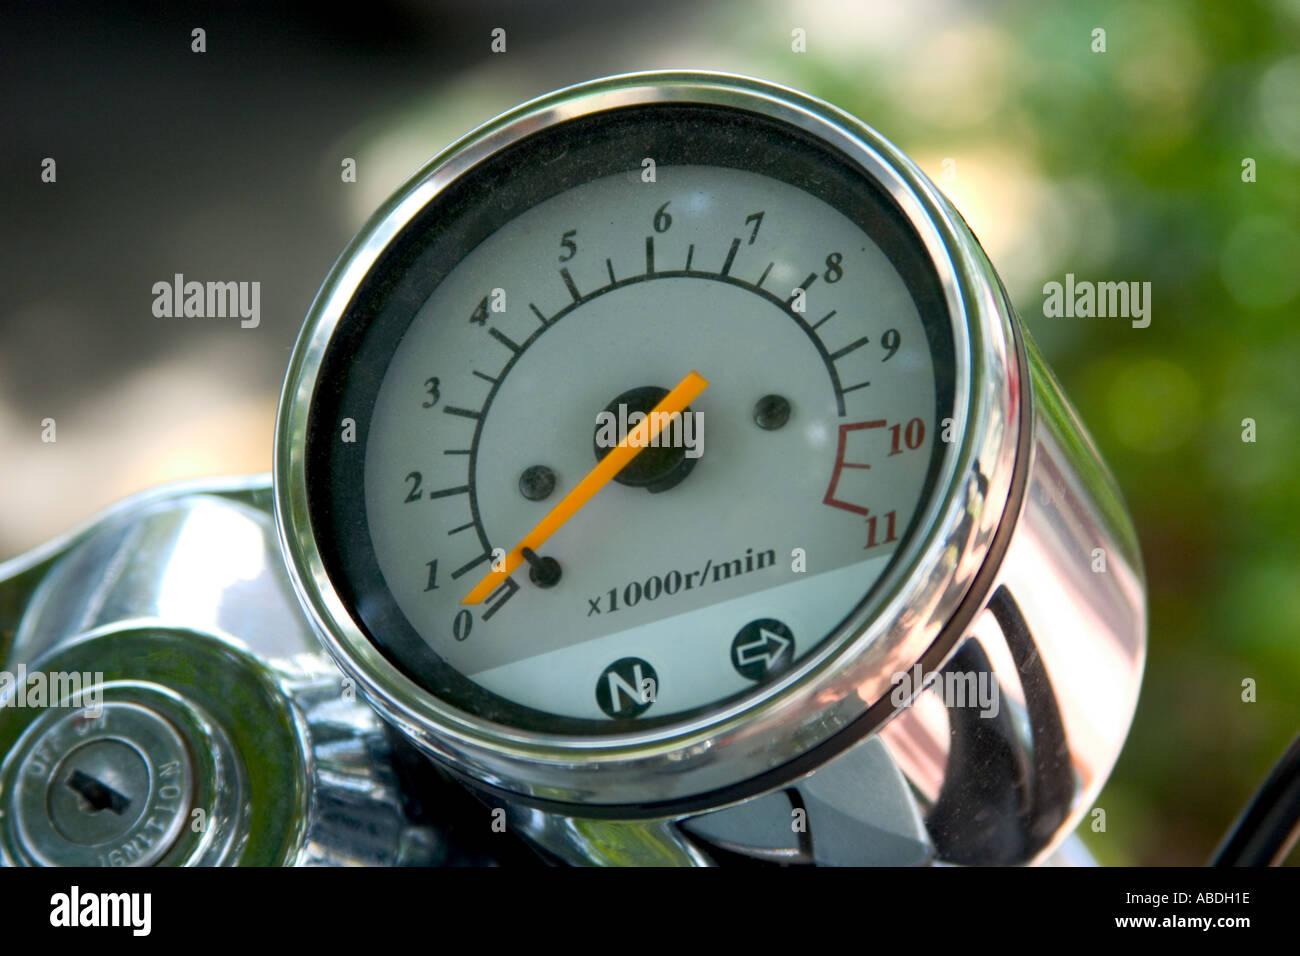 closeup of motorcycle rev meter - Stock Image